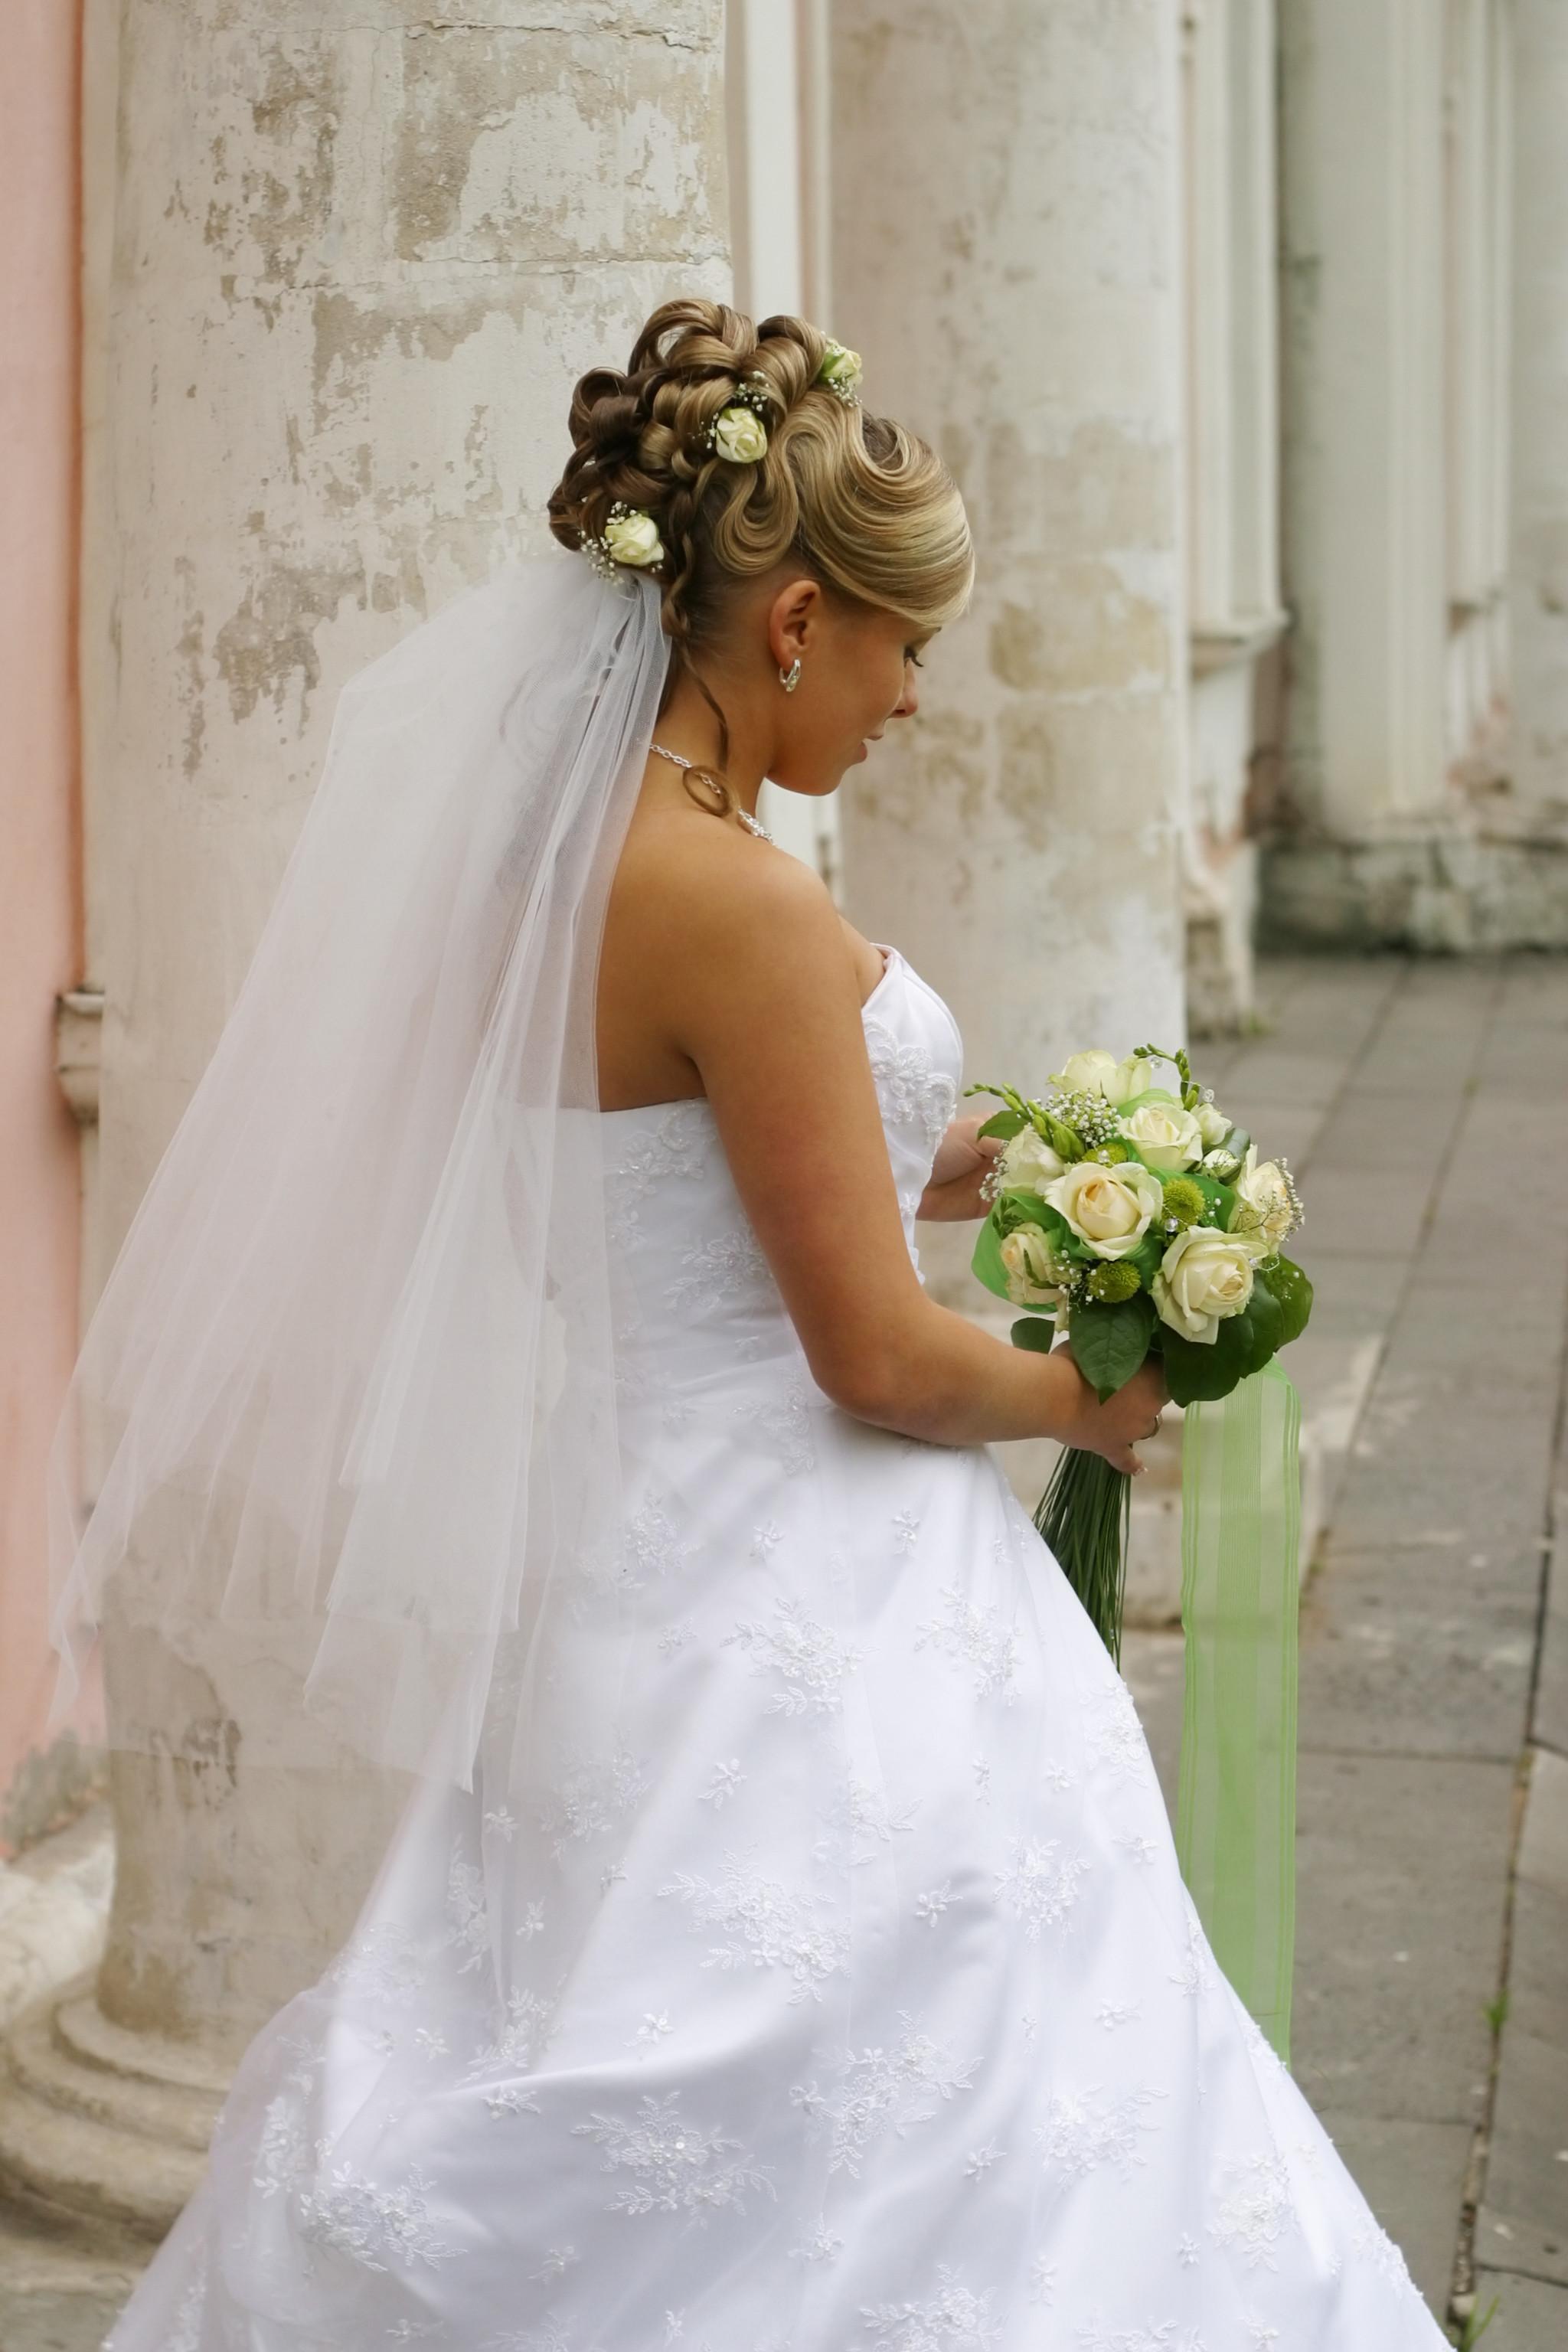 Bridal Style, Updo